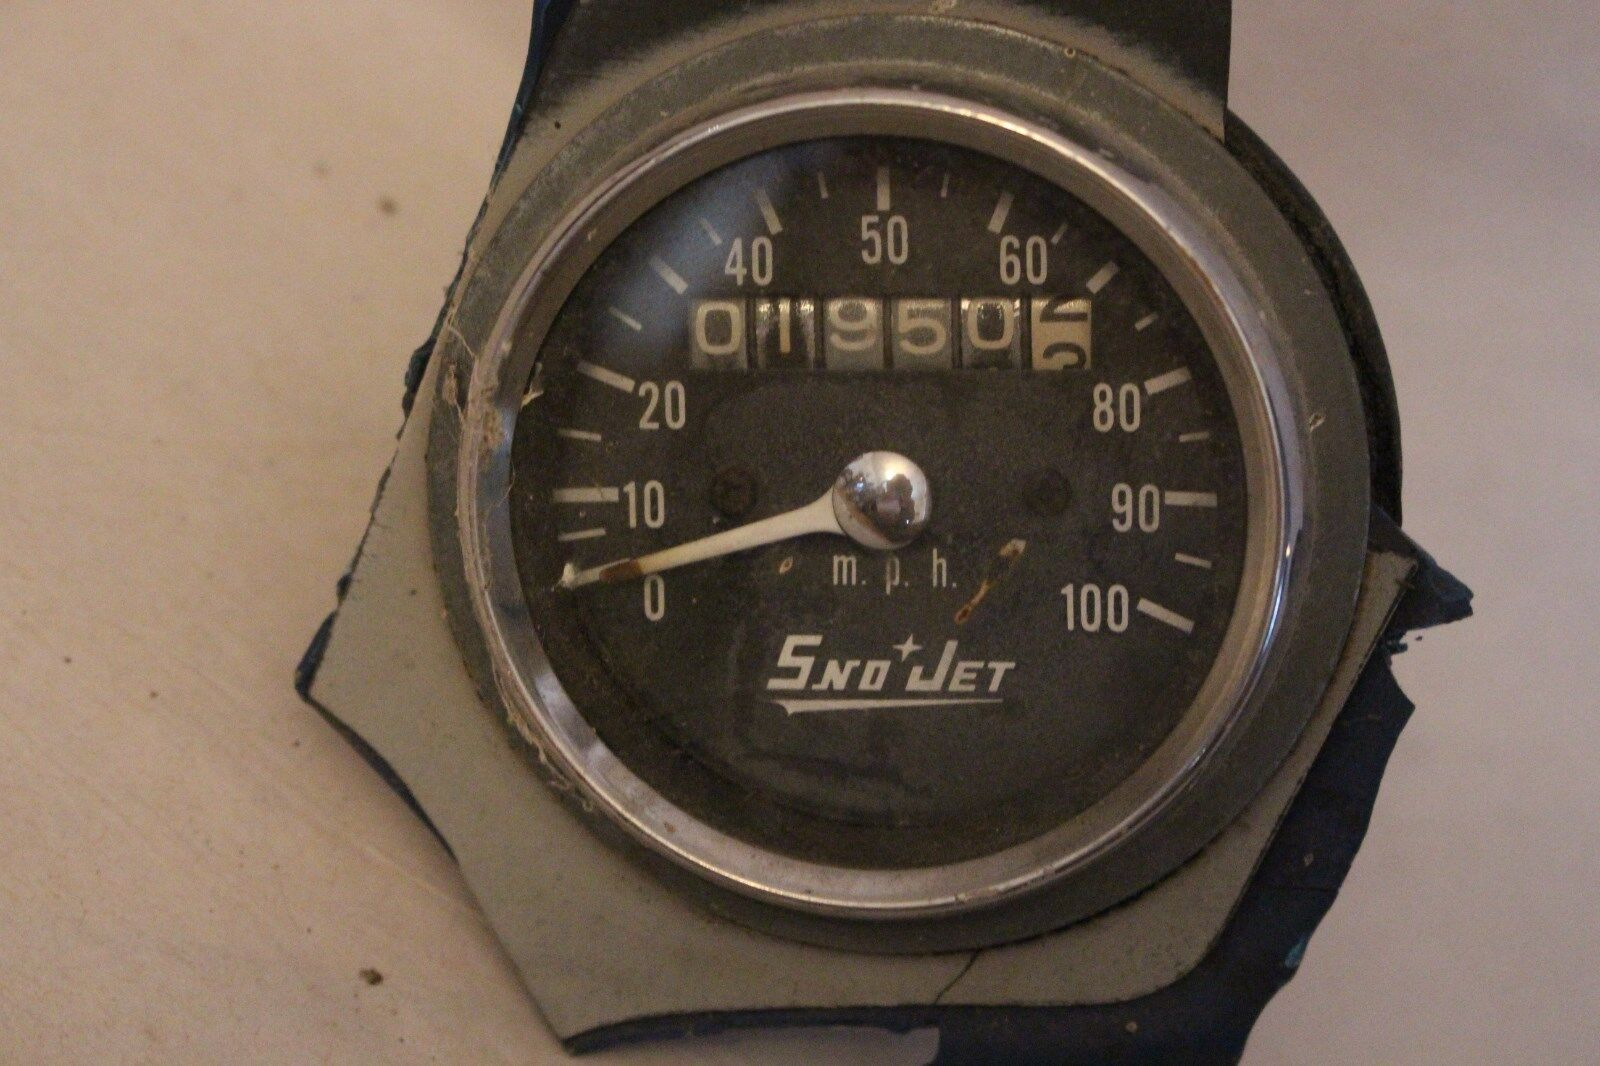 Vintage OEM Sno Jet Speedometer Sled Snowmobile Part Thunder Jet Dash Cluster